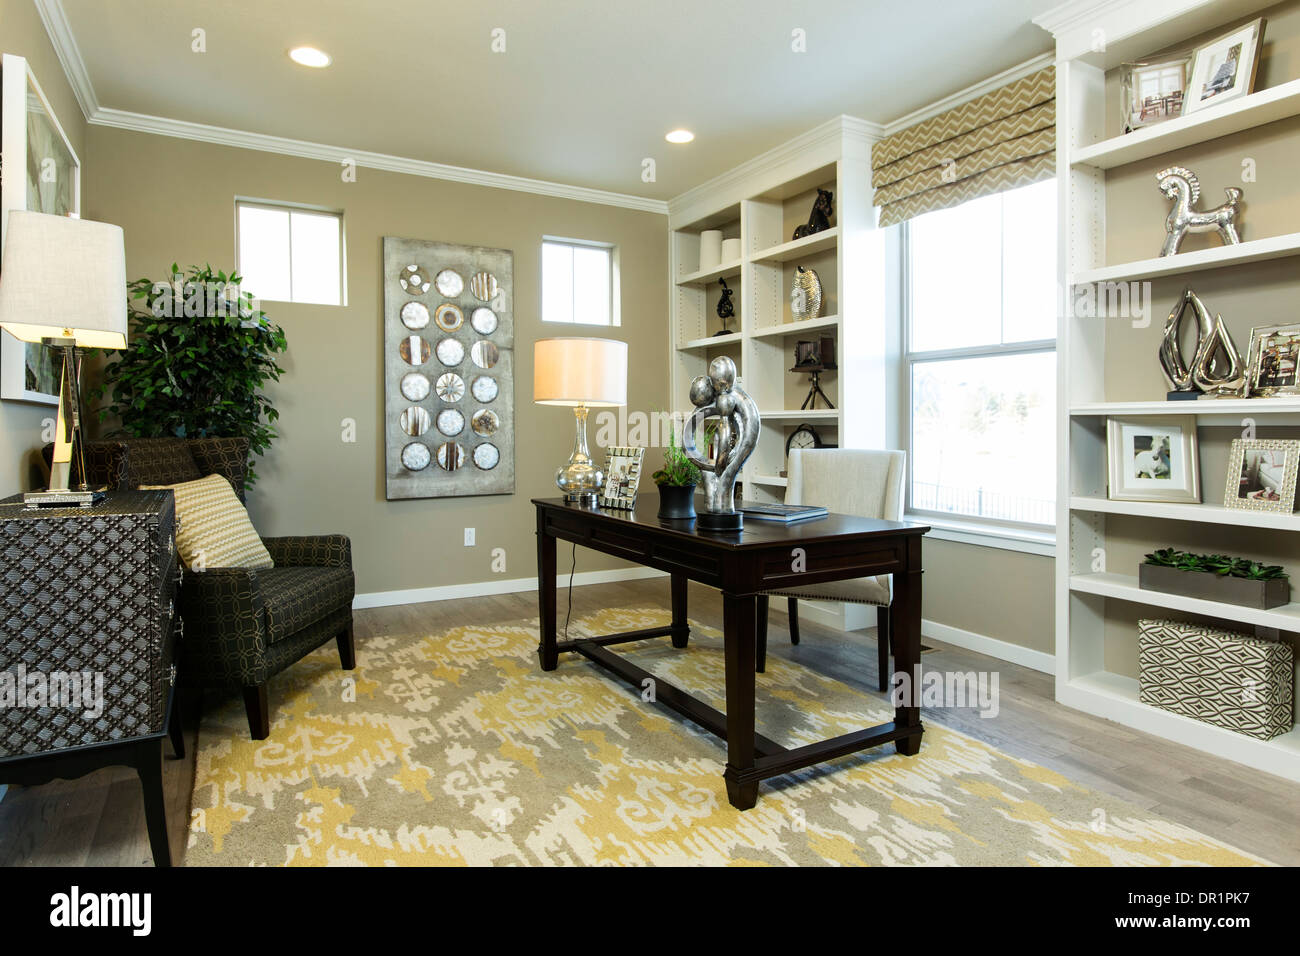 Studie, Dorfhäuser Modell zu Hause, Arvada, Colorado USA Stockbild